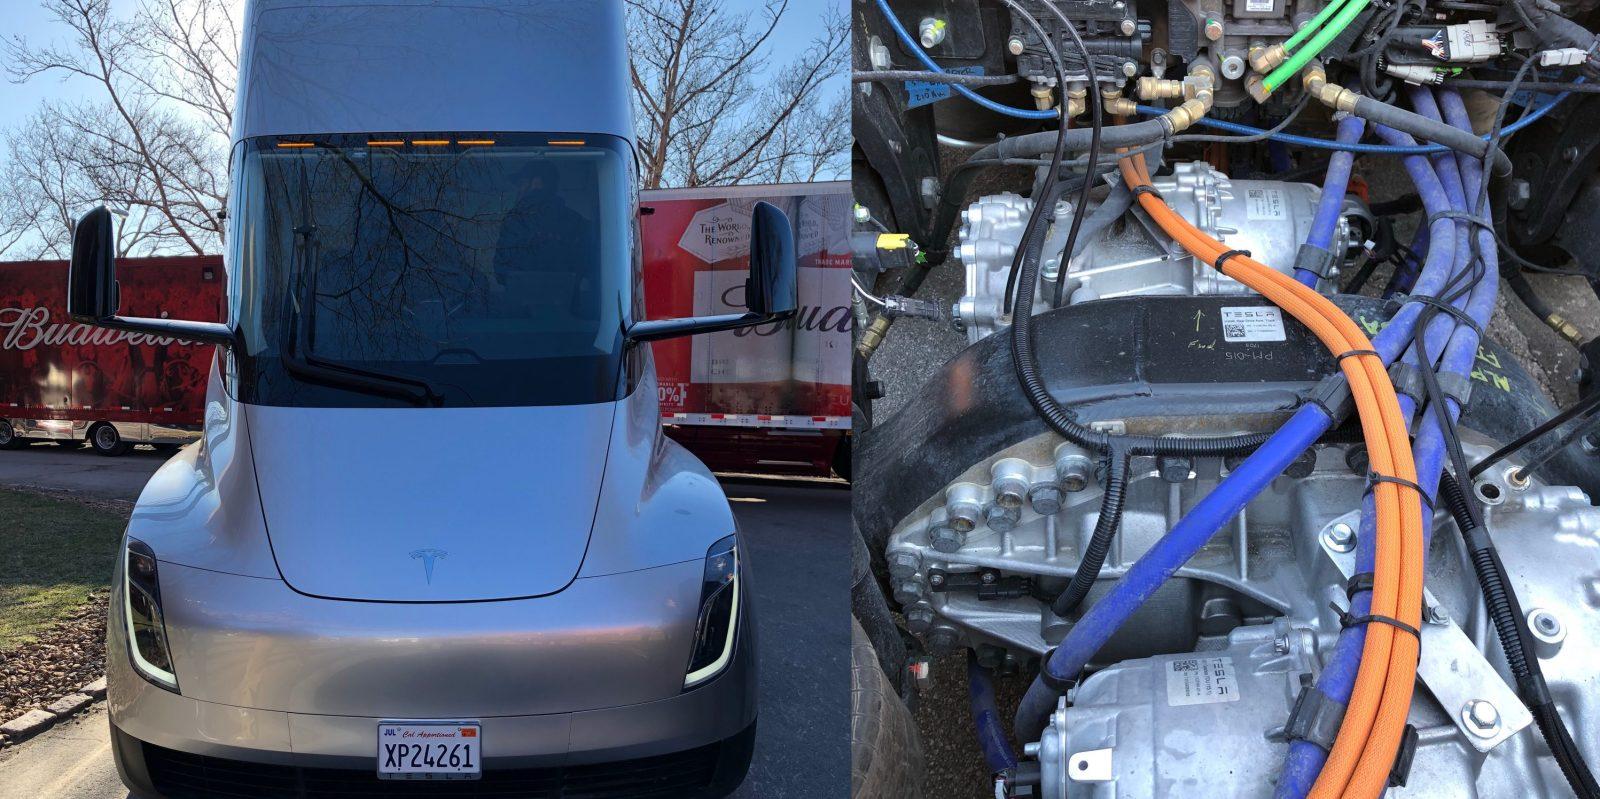 Mercedes Benz Fremont >> A closer look at a Tesla Semi electric truck prototype and its electric motors - Electrek